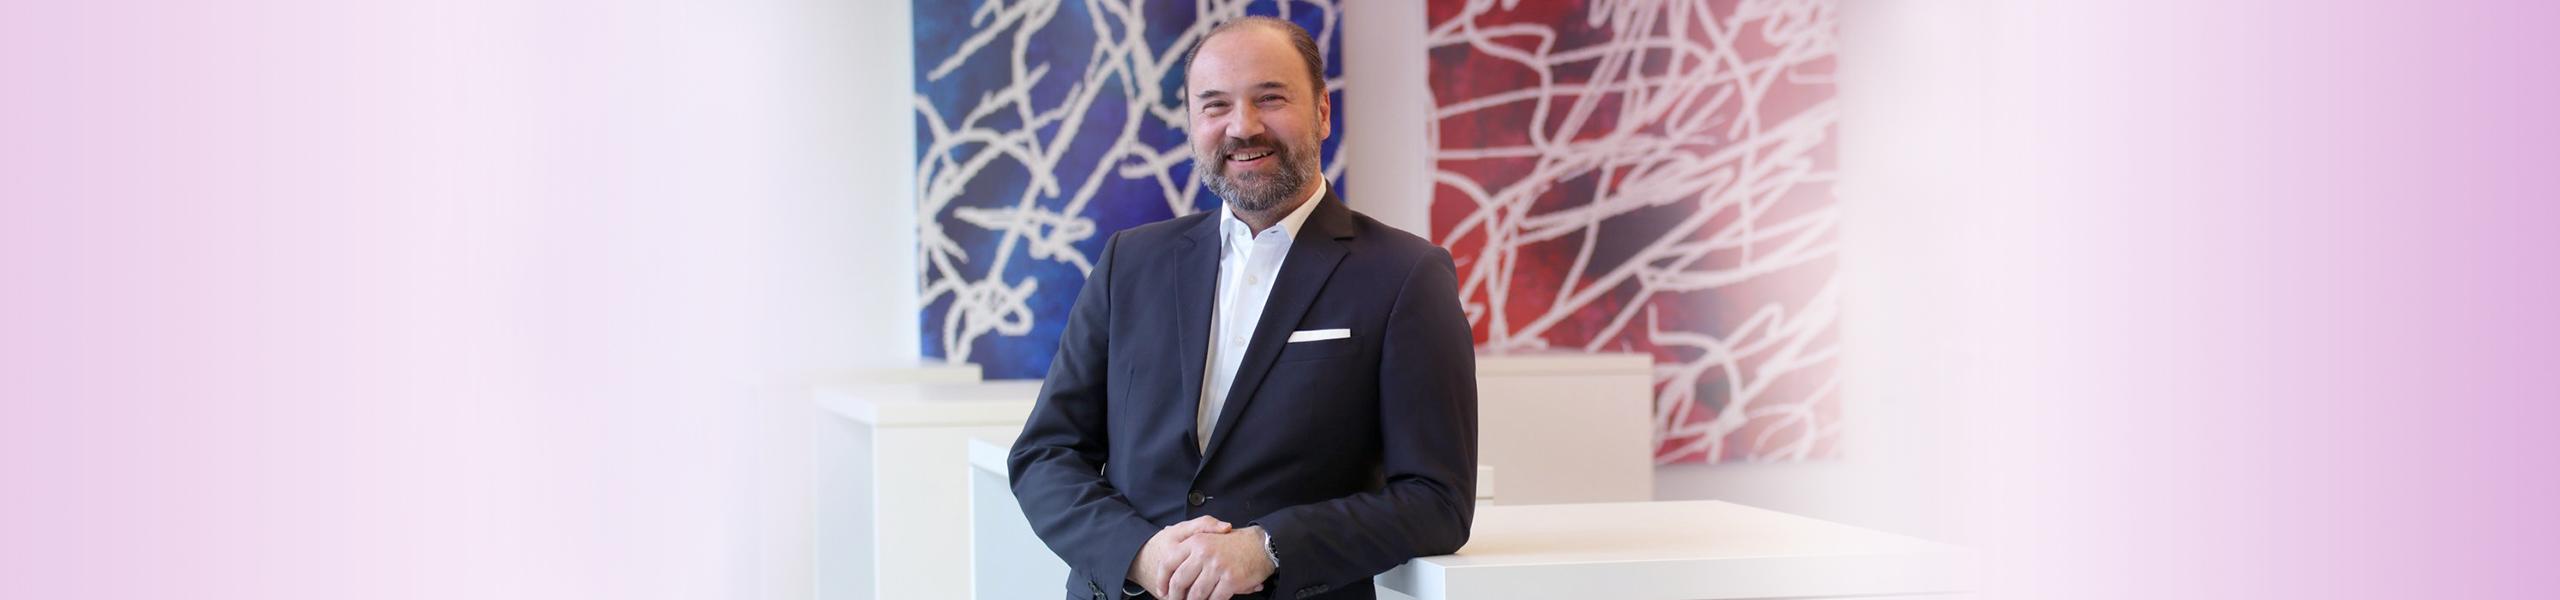 Žarko Zrno Berater der KfW Bankengruppe